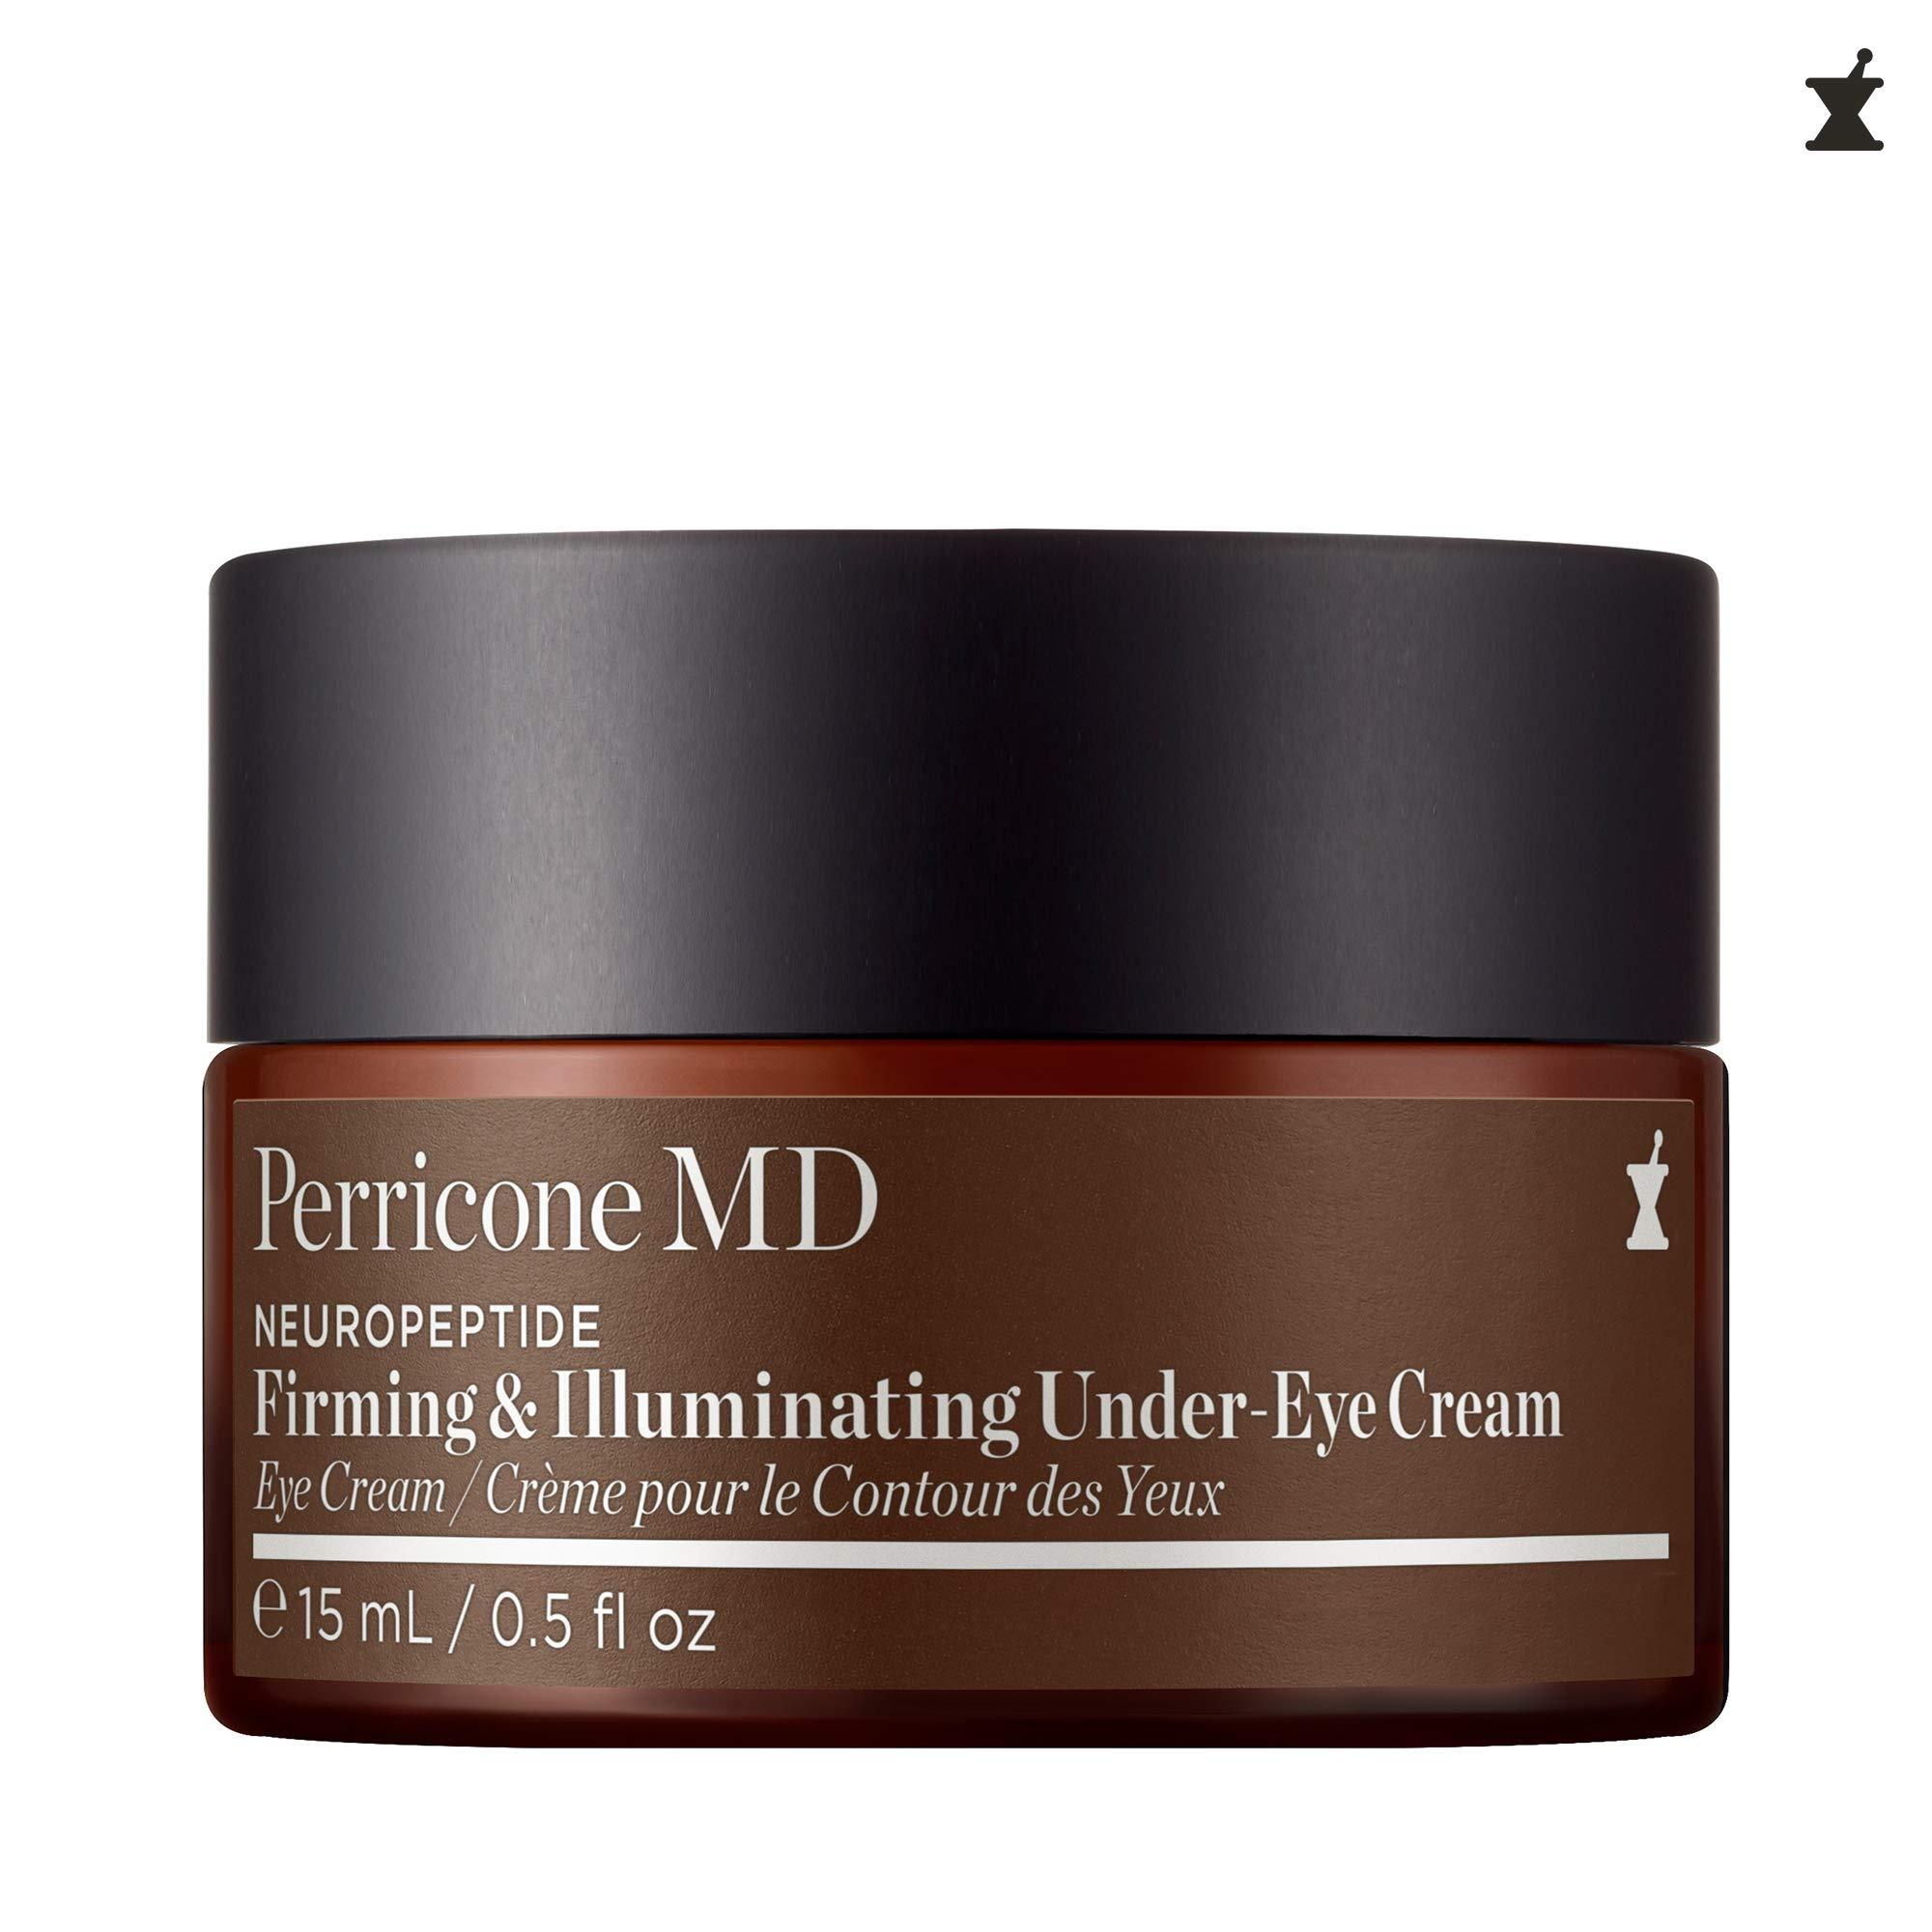 Perricone MD Neuropeptide Firming & Illuminating Under Eye Cream, 0.5 Fluid Ounce